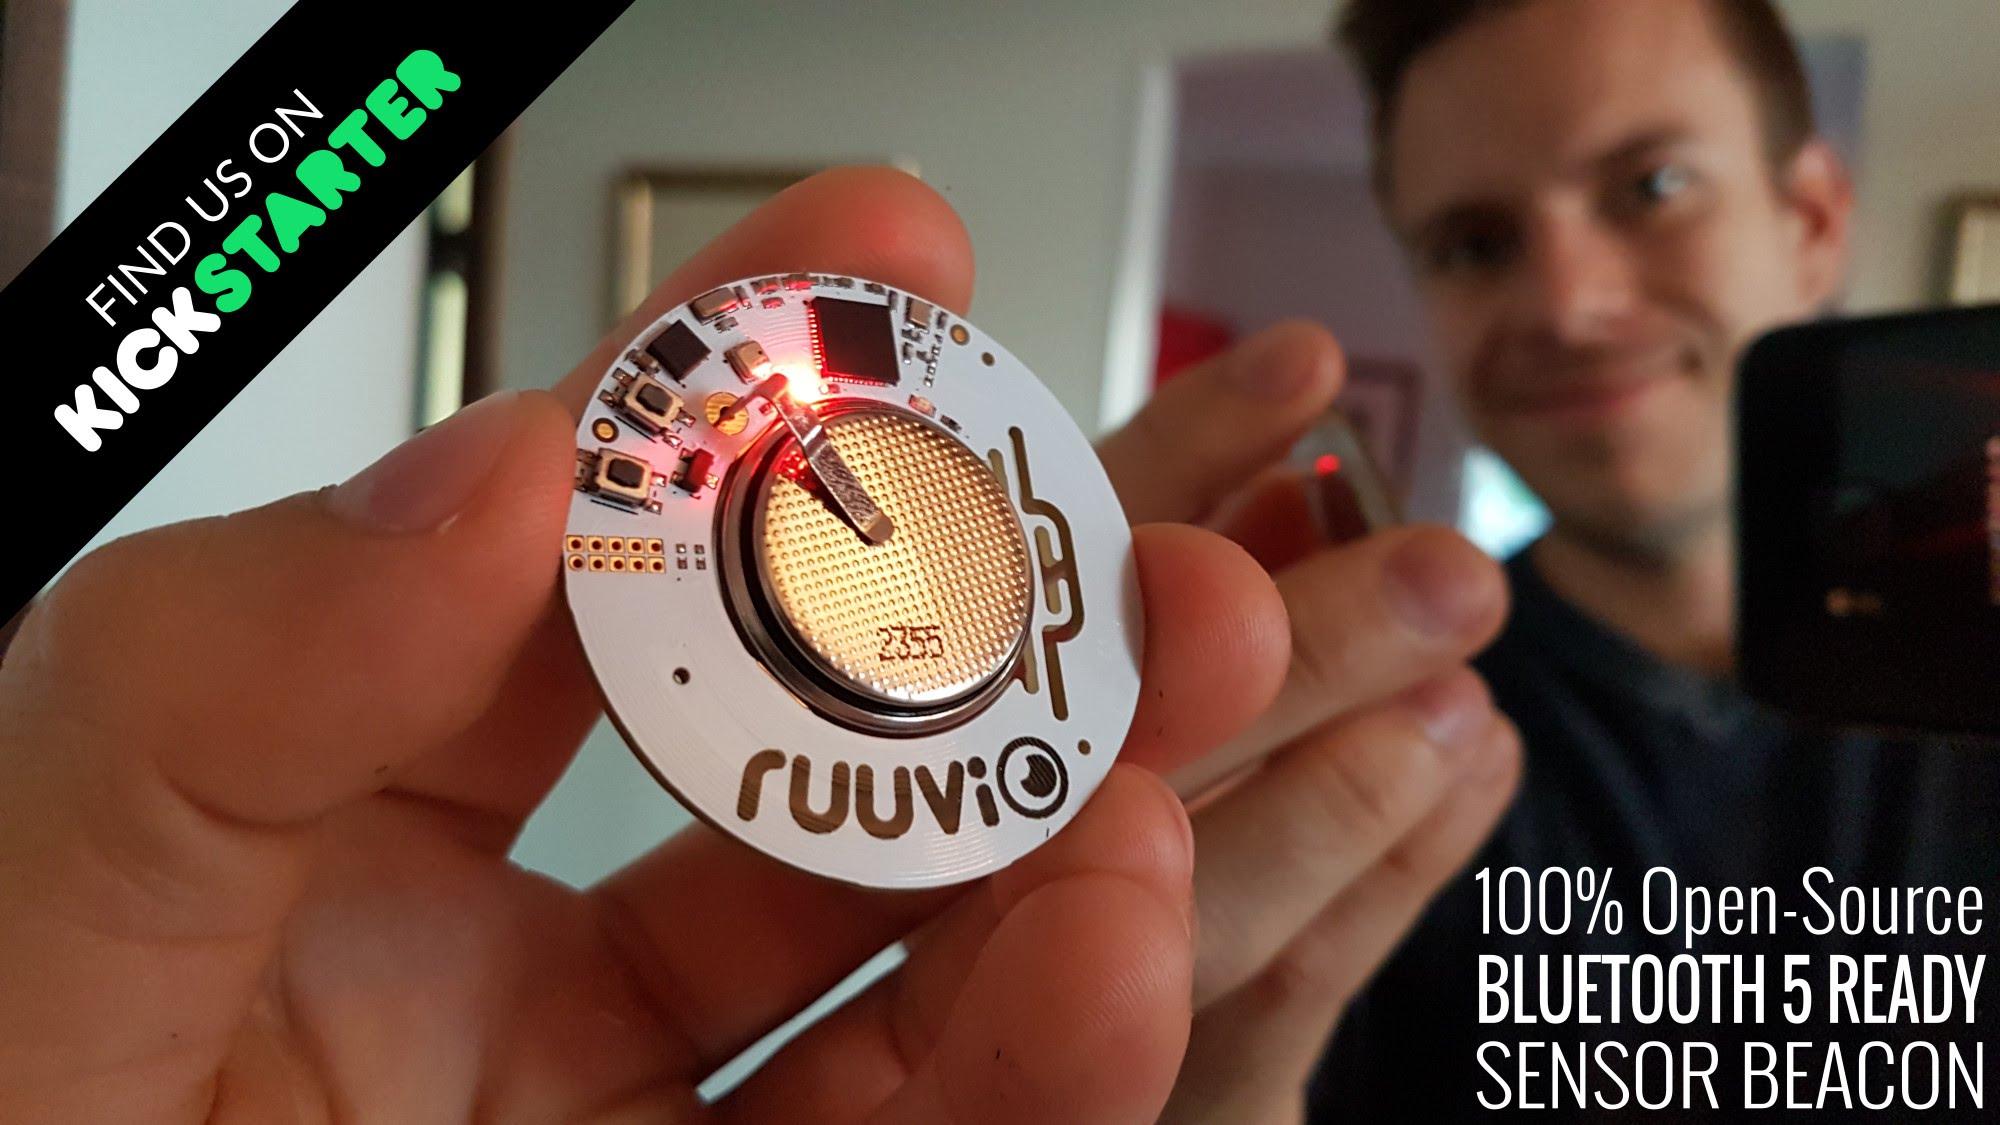 RuuviTag – Open-Source Bluetooth Sensor Beacon